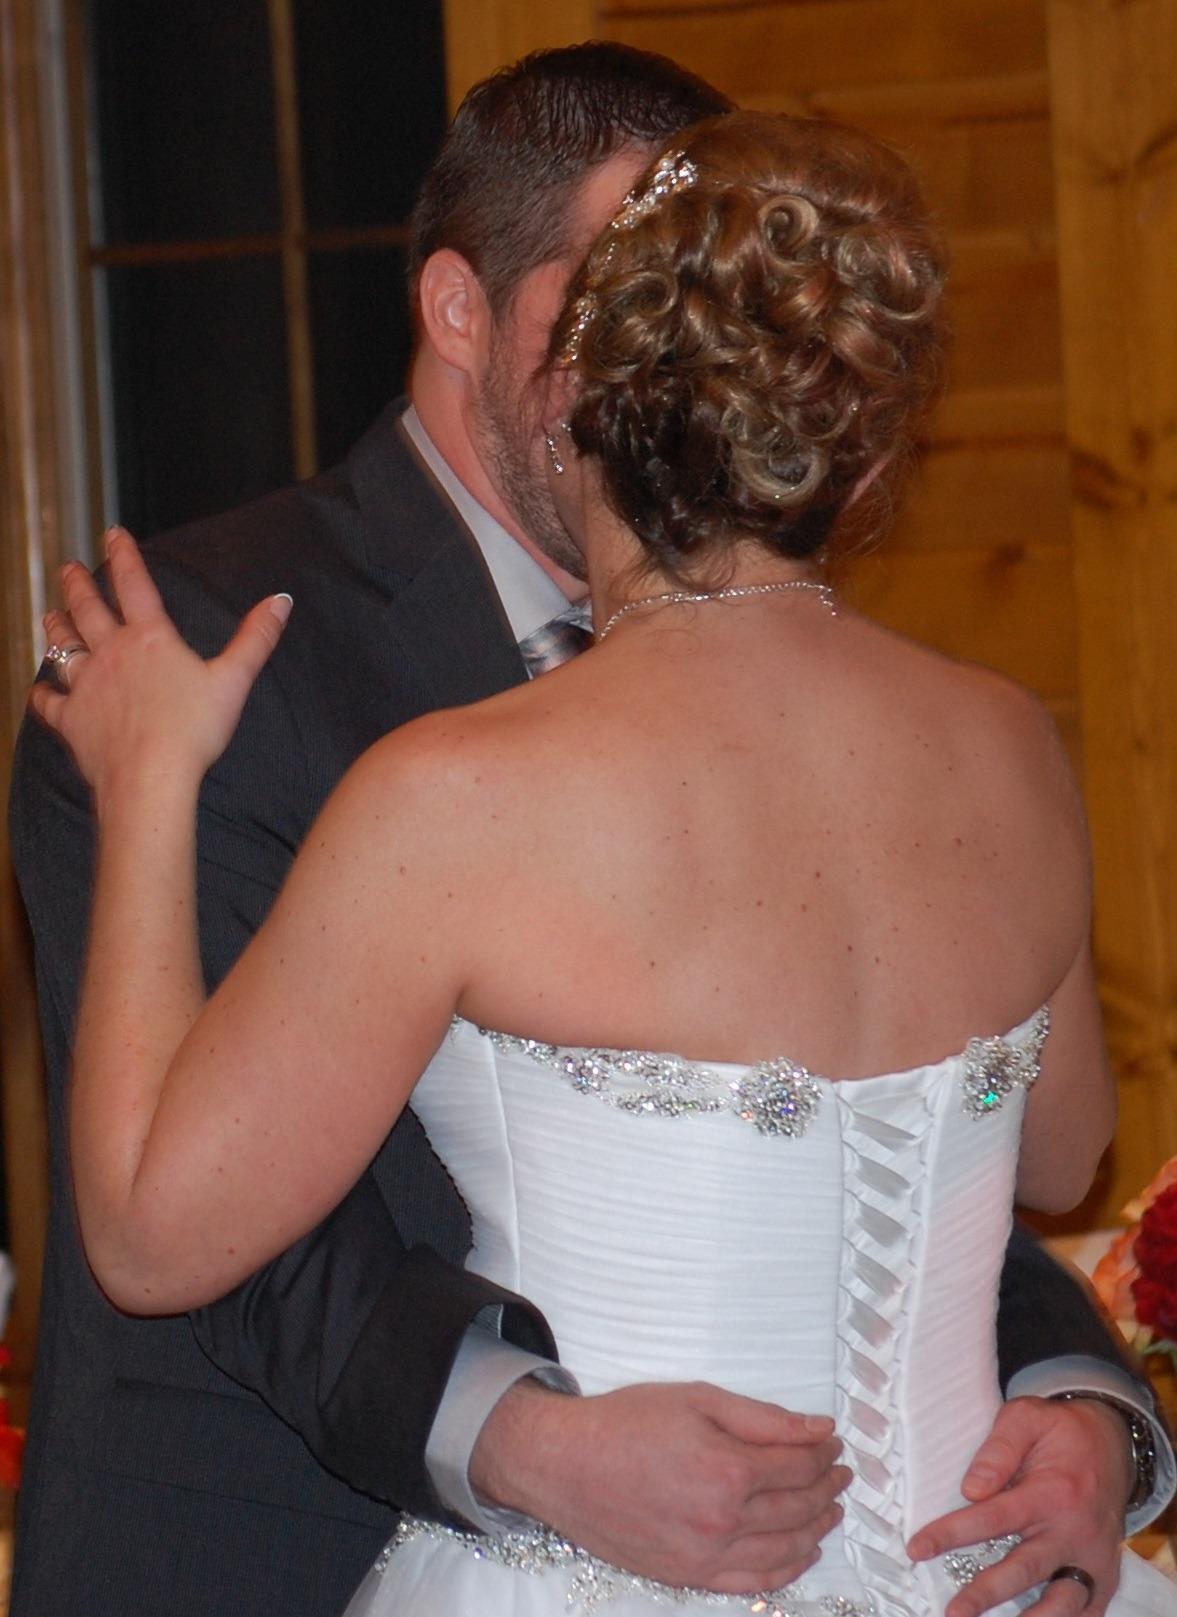 Stacys Wedding Wearing RockTape